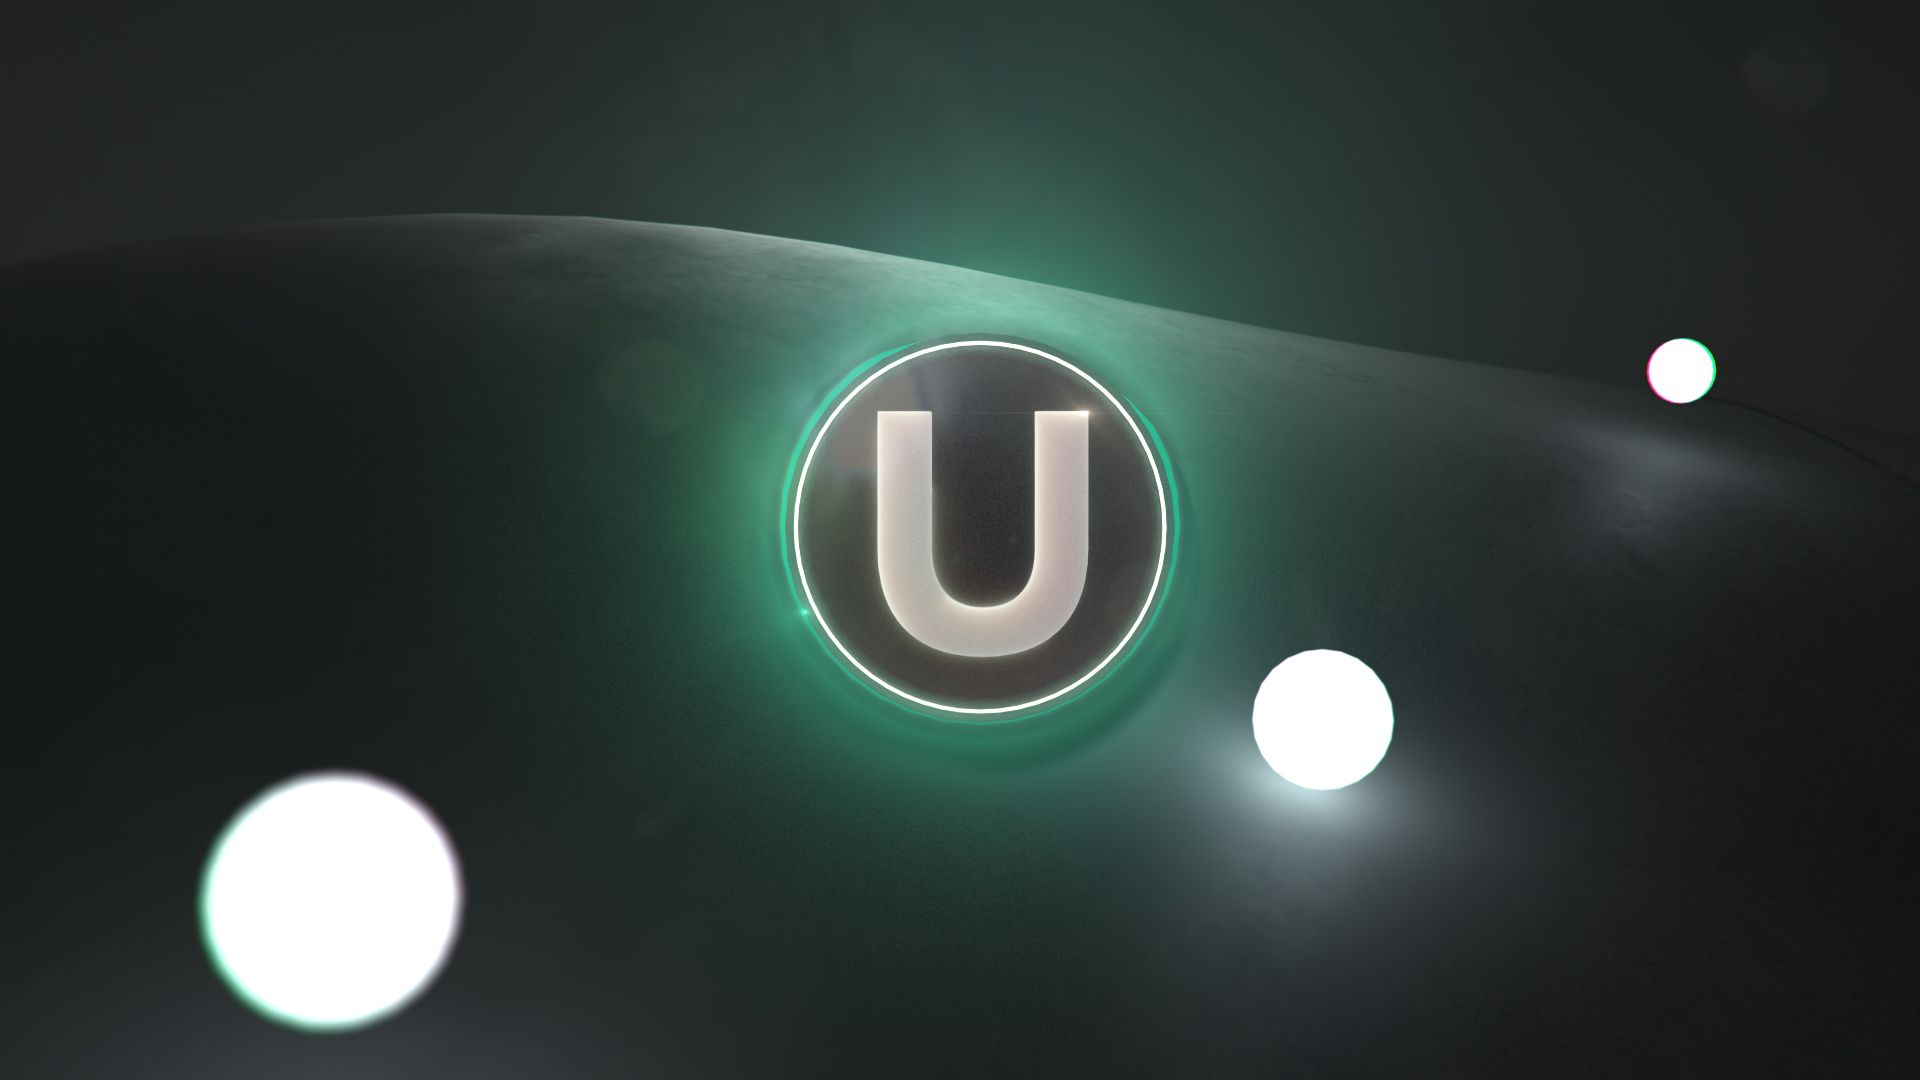 08_Ubro_Frame